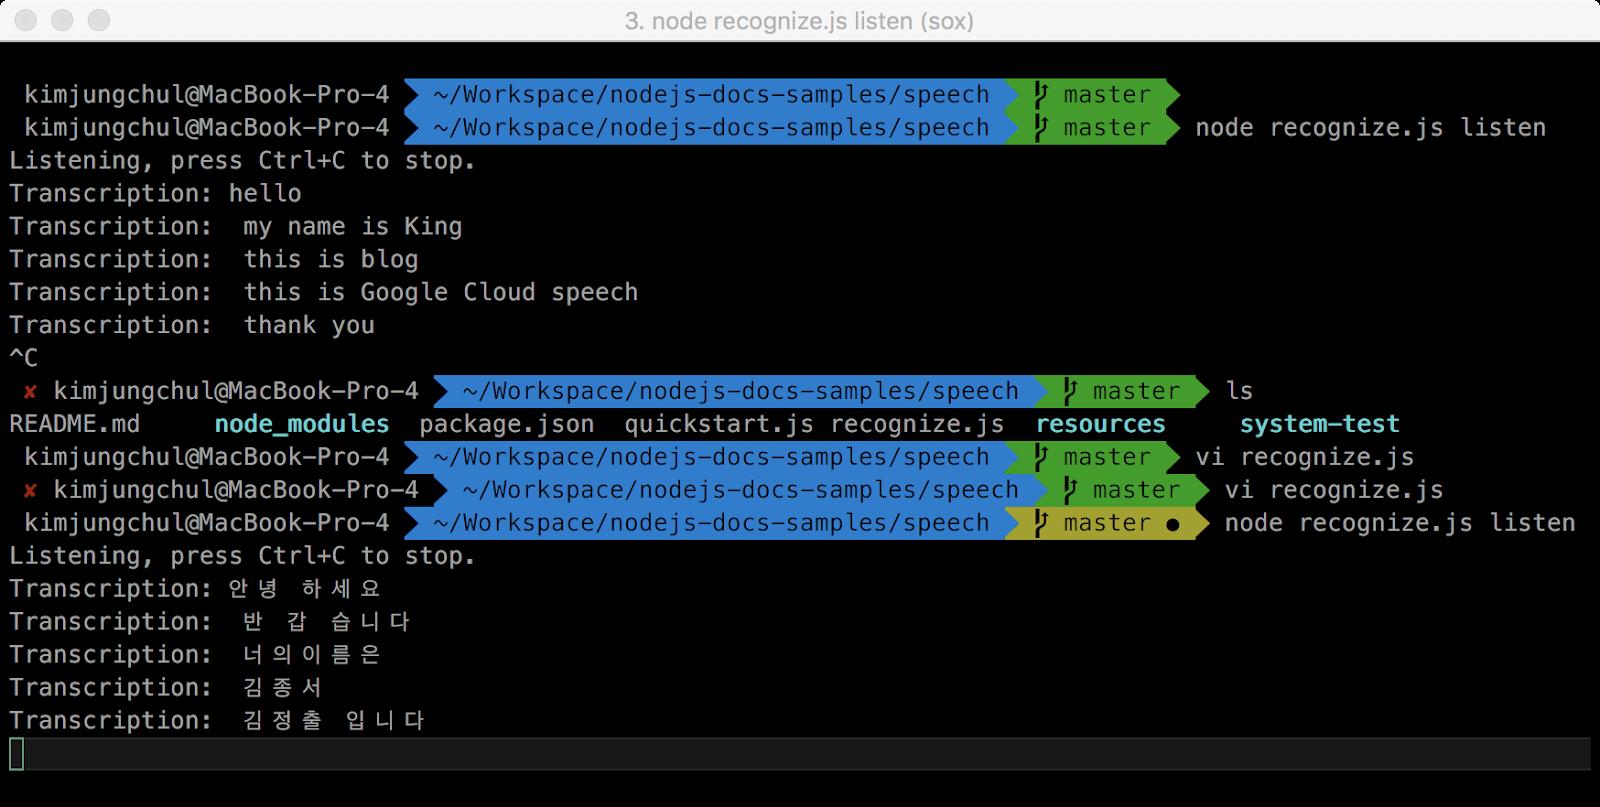 Google Cloud Speech 음성인식 API python, nodejs